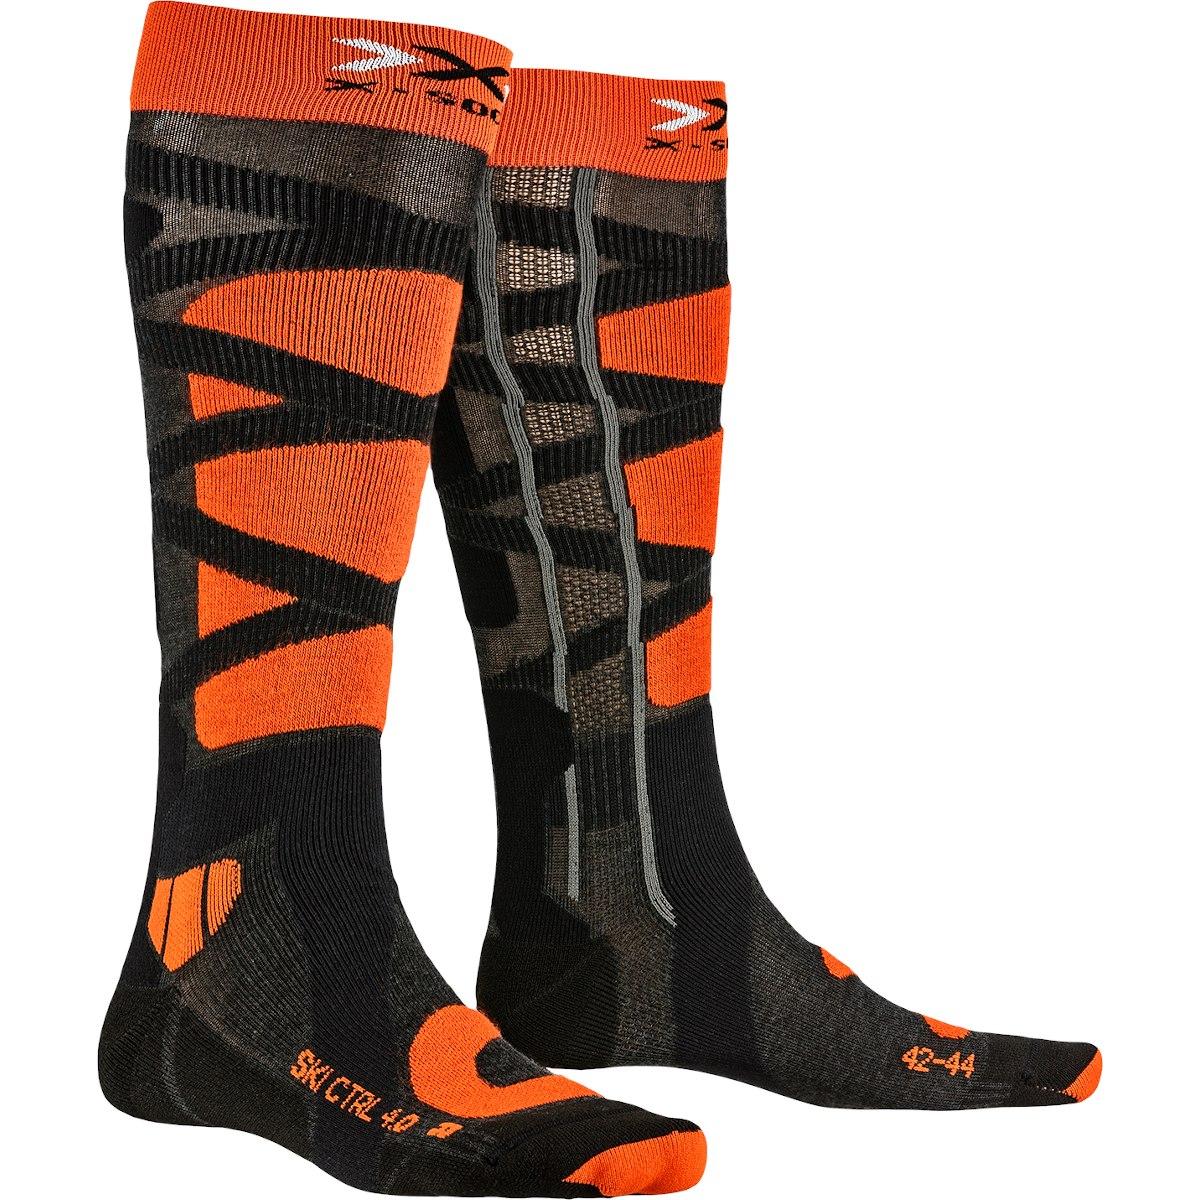 X-Socks Ski Control 4.0 Socken - anthracite melange/x-orange